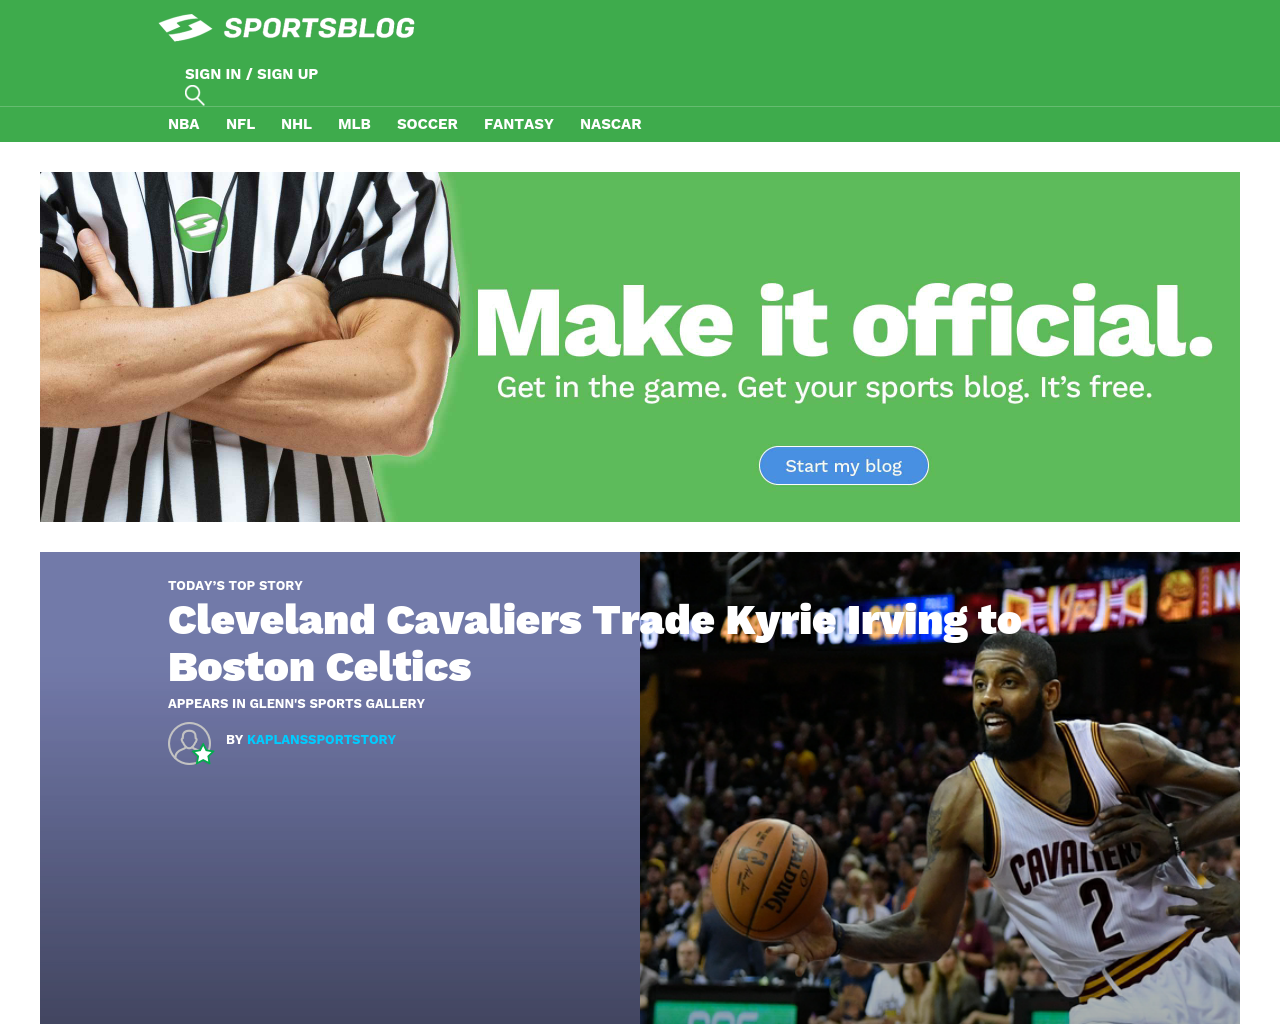 SportsBlog-Media-Group-Advertising-Reviews-Pricing